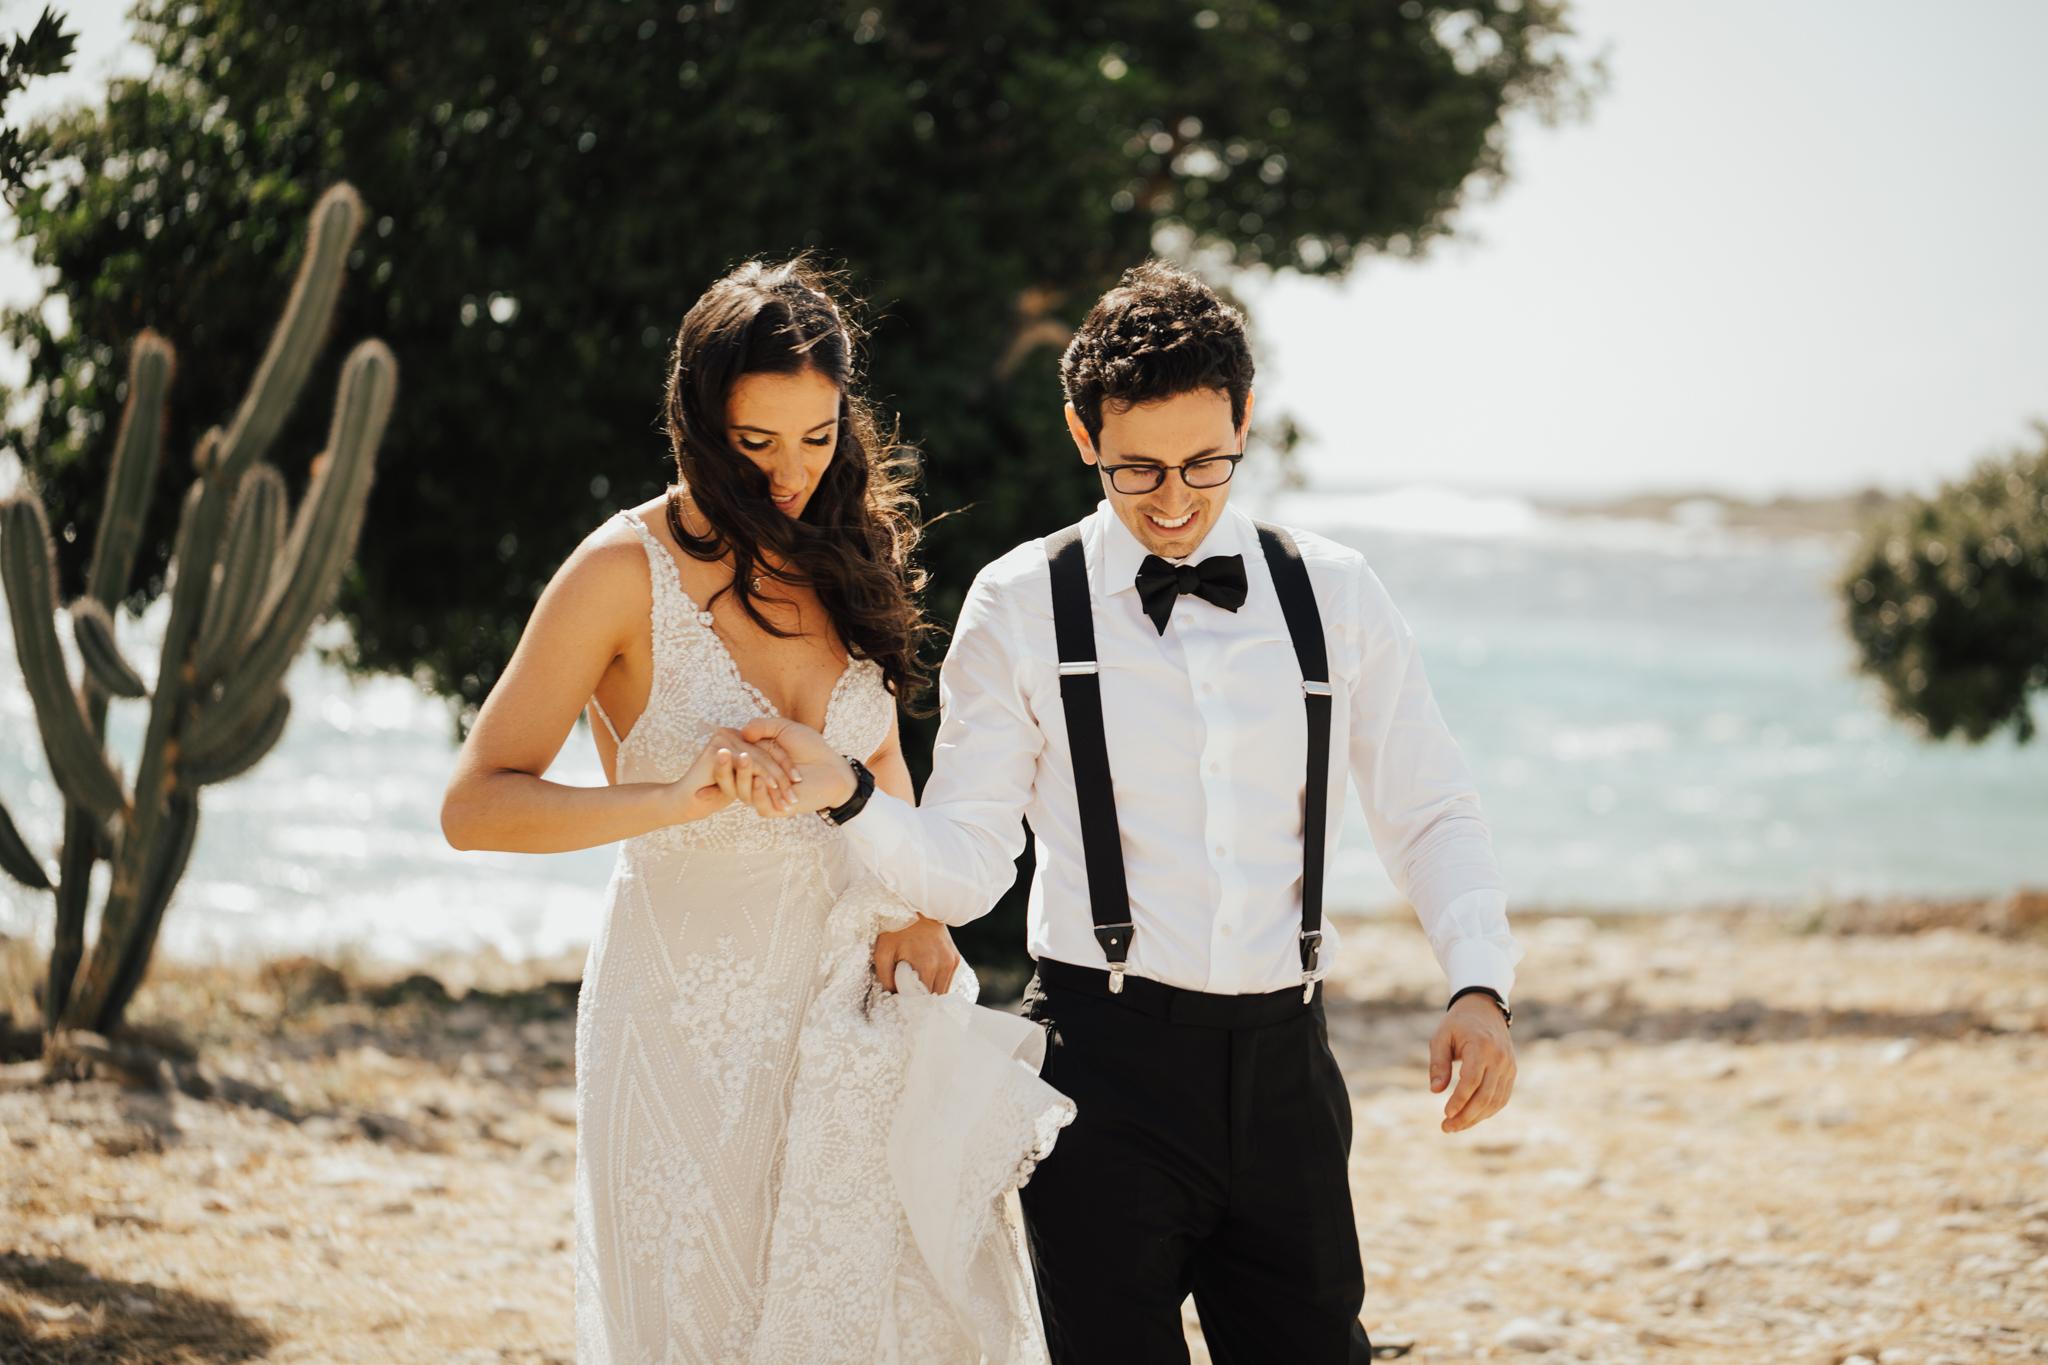 documentary wedding photography nyc